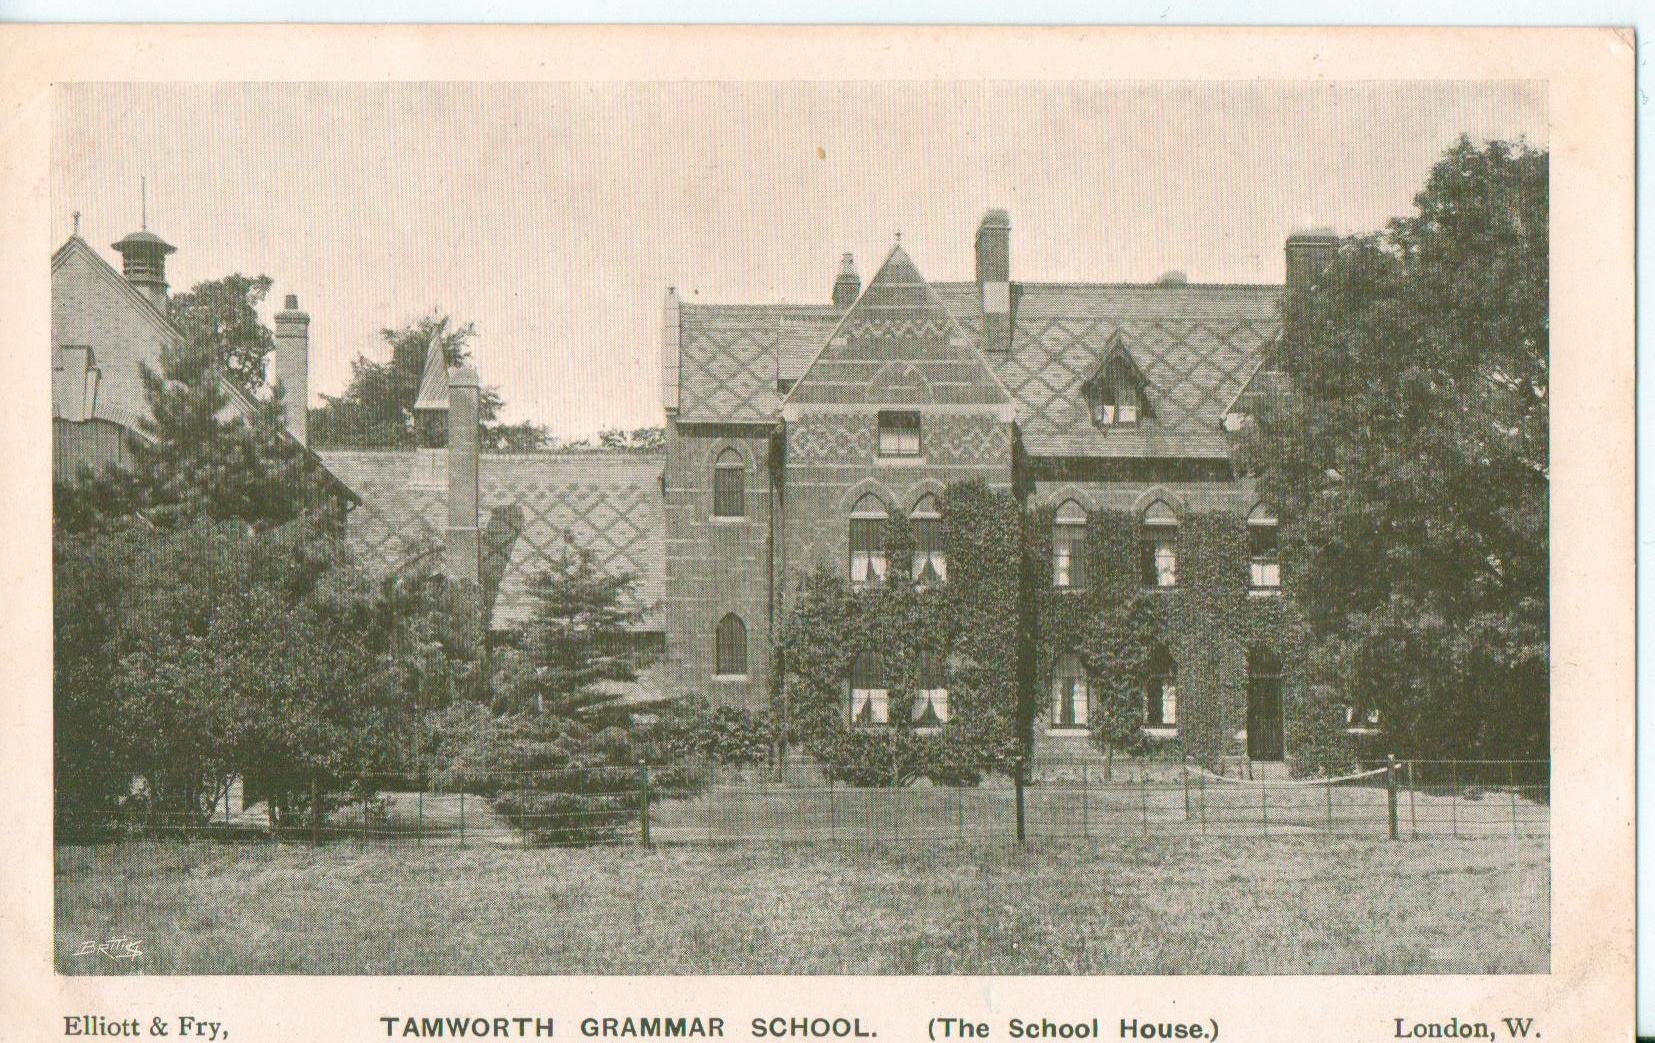 Tamworth Grammer School.